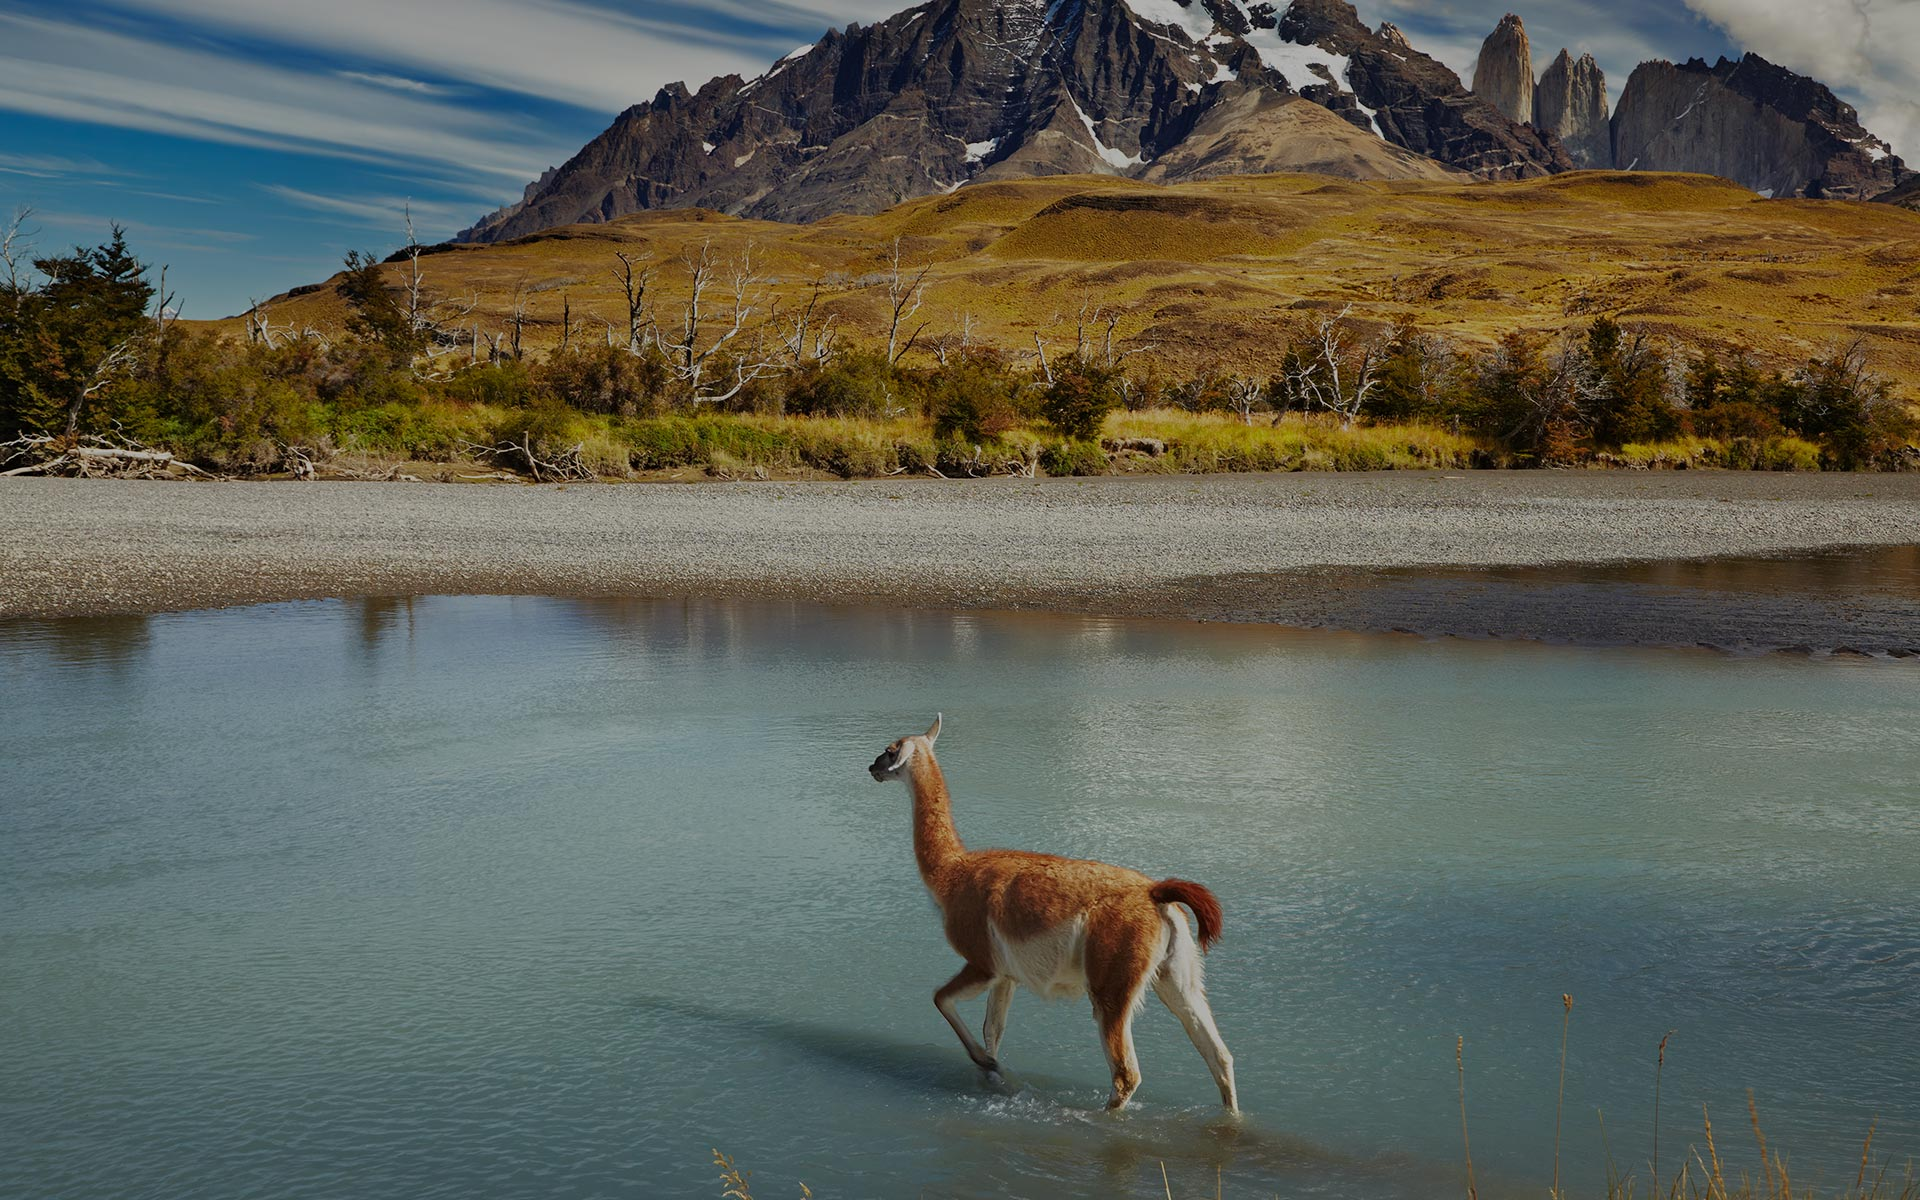 Explore South America under $1000